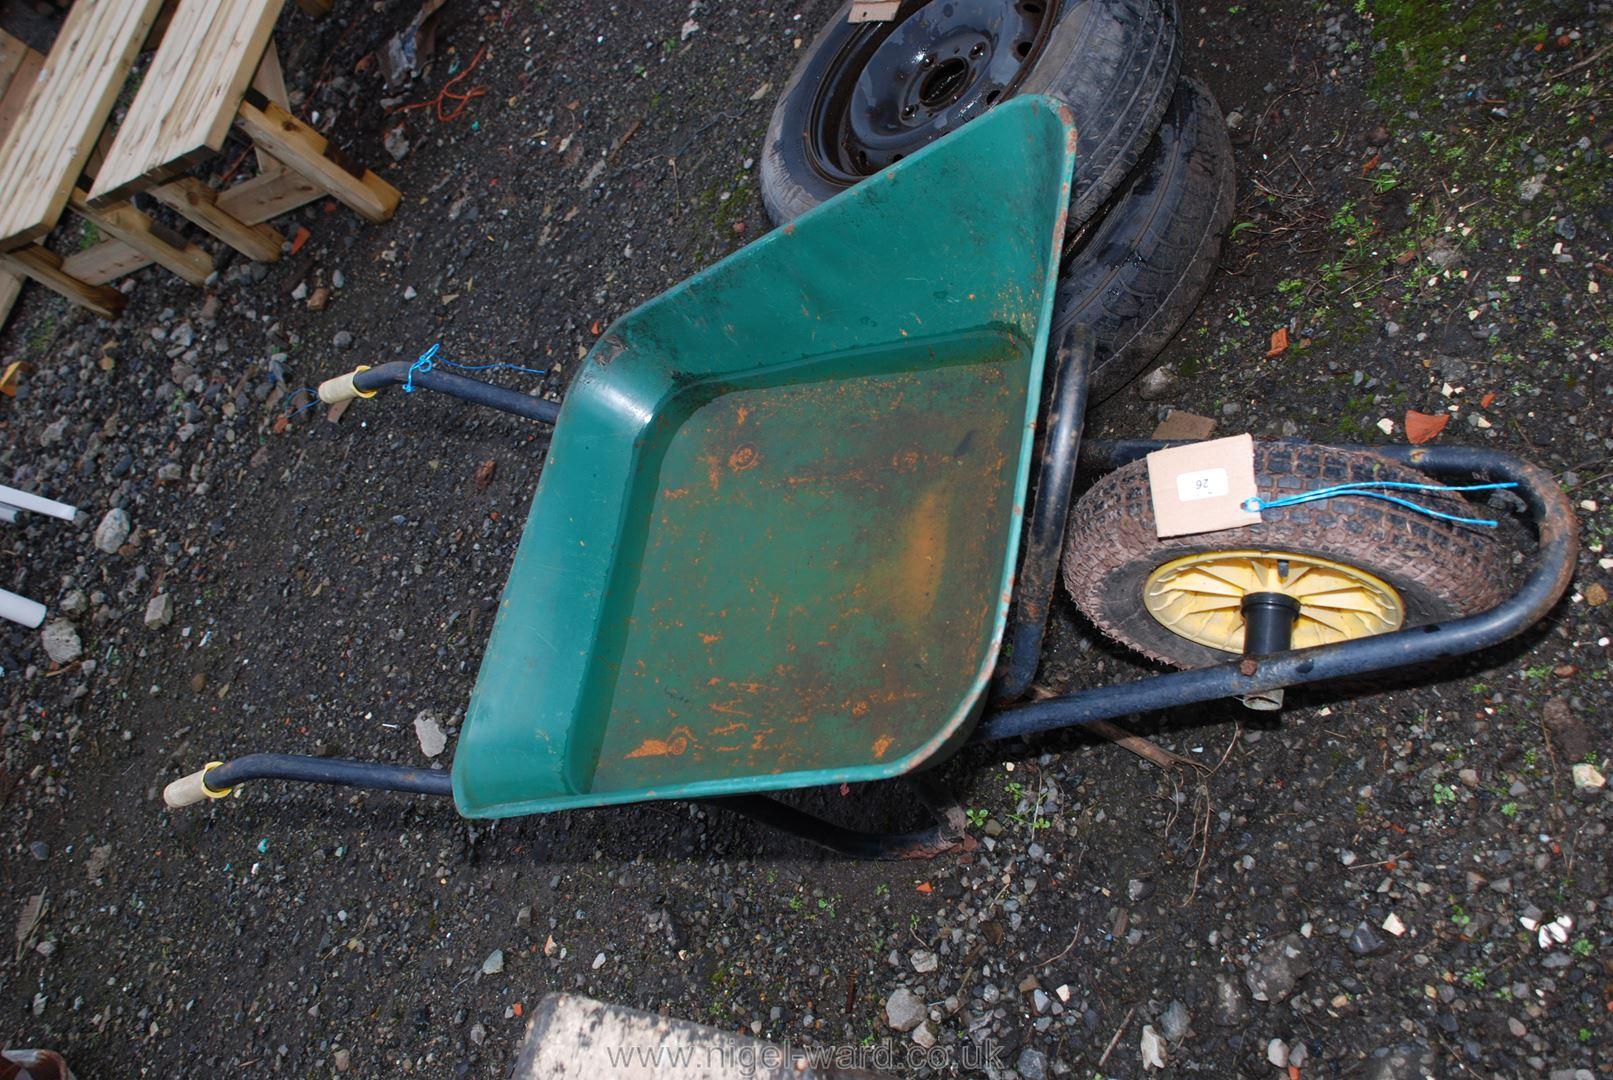 Green wheelbarrow with pneumatic tyre